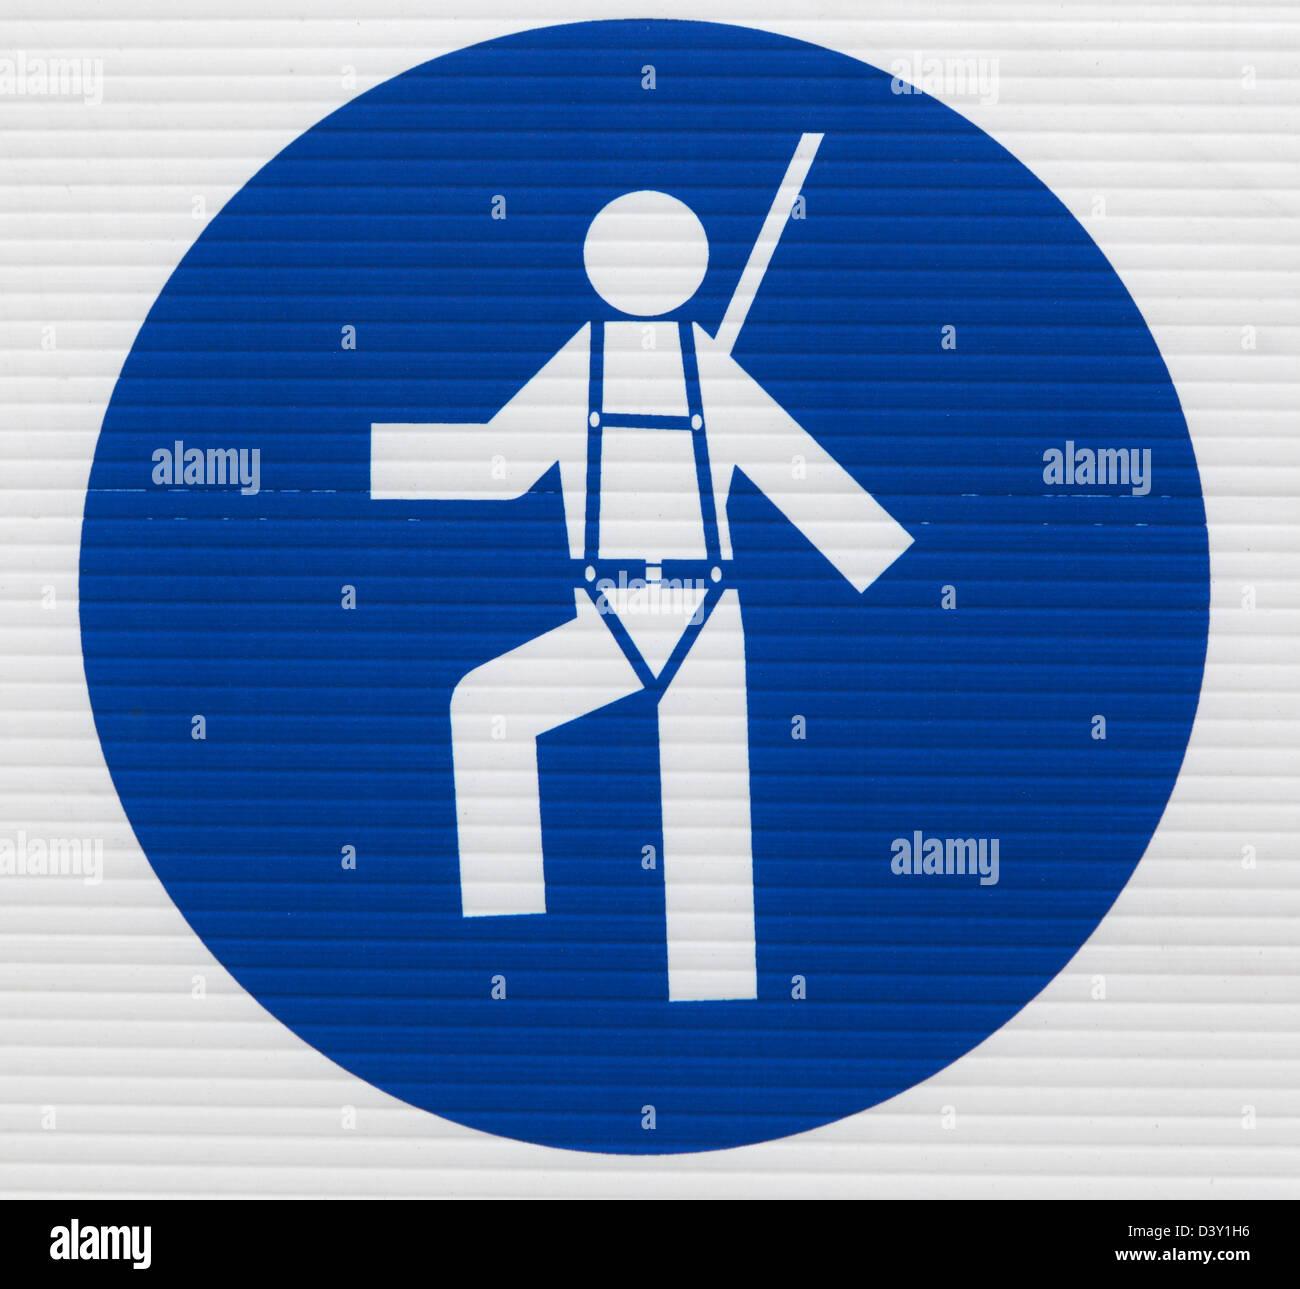 Santa Margherita di Pula, Italy, mandatory label, safety rope wear - Stock Image